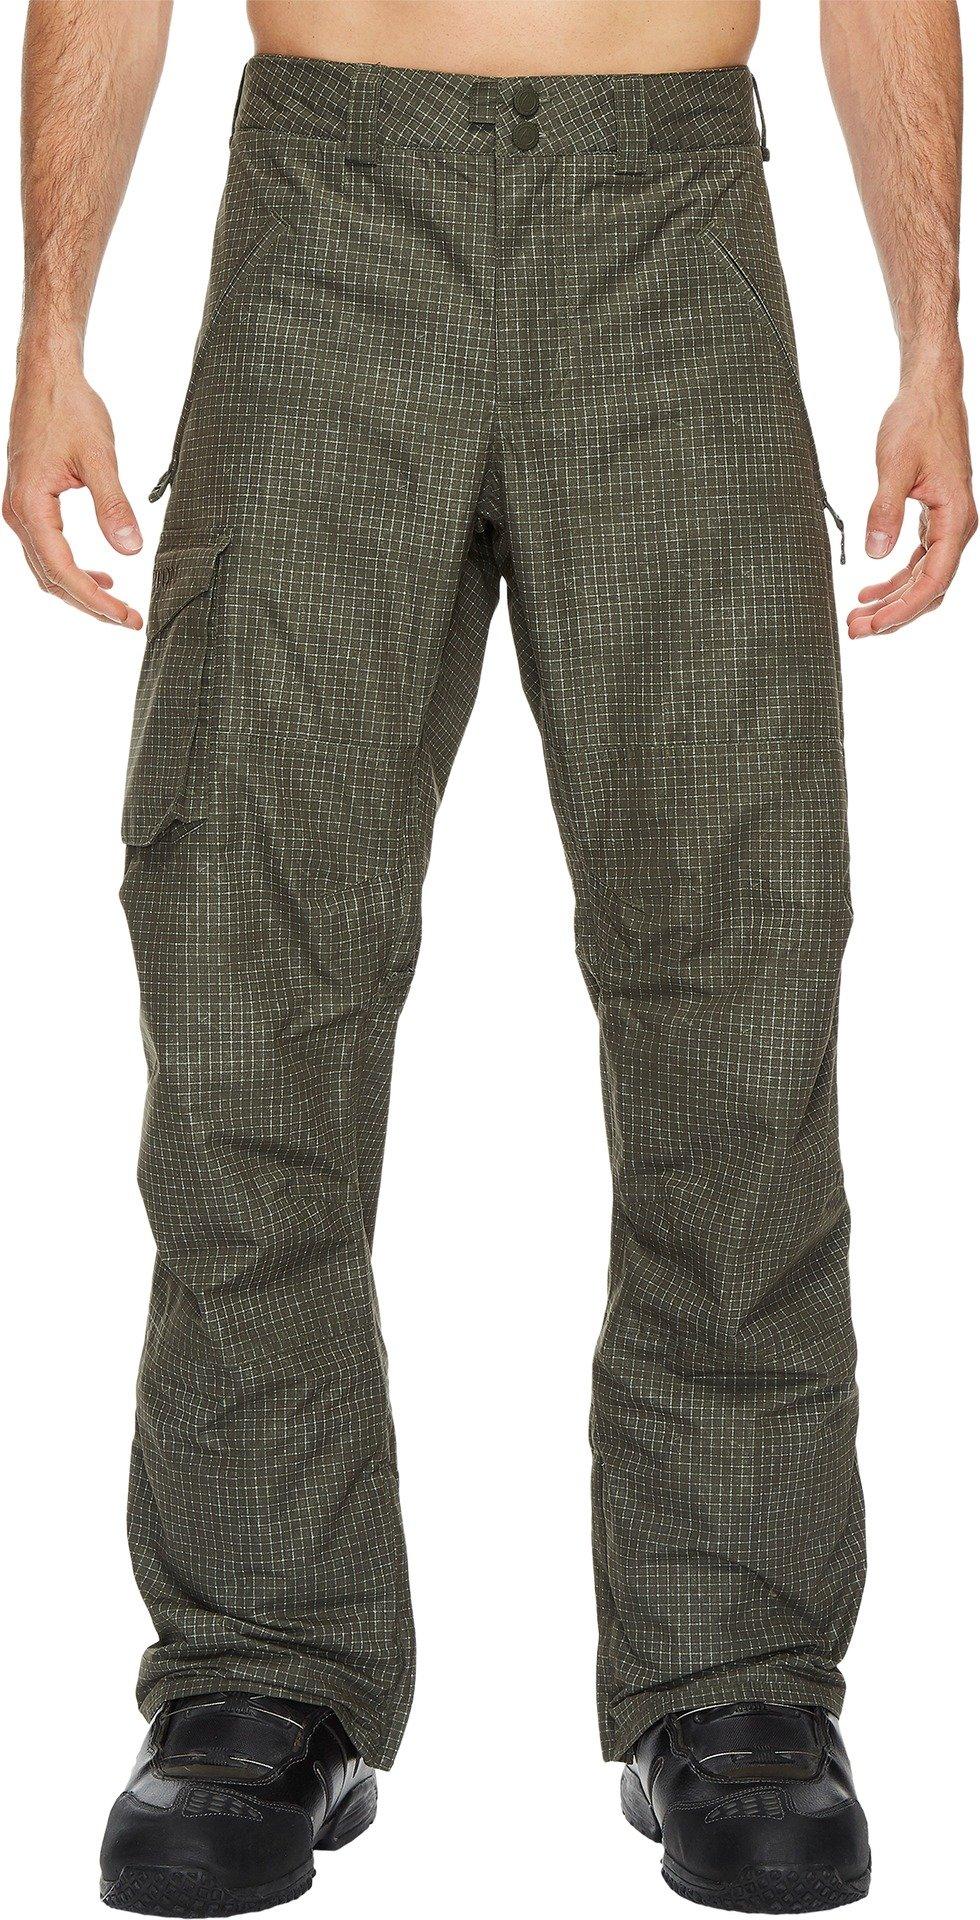 Burton Men's Covert Pant Forest Night Ripstop X-Small 33